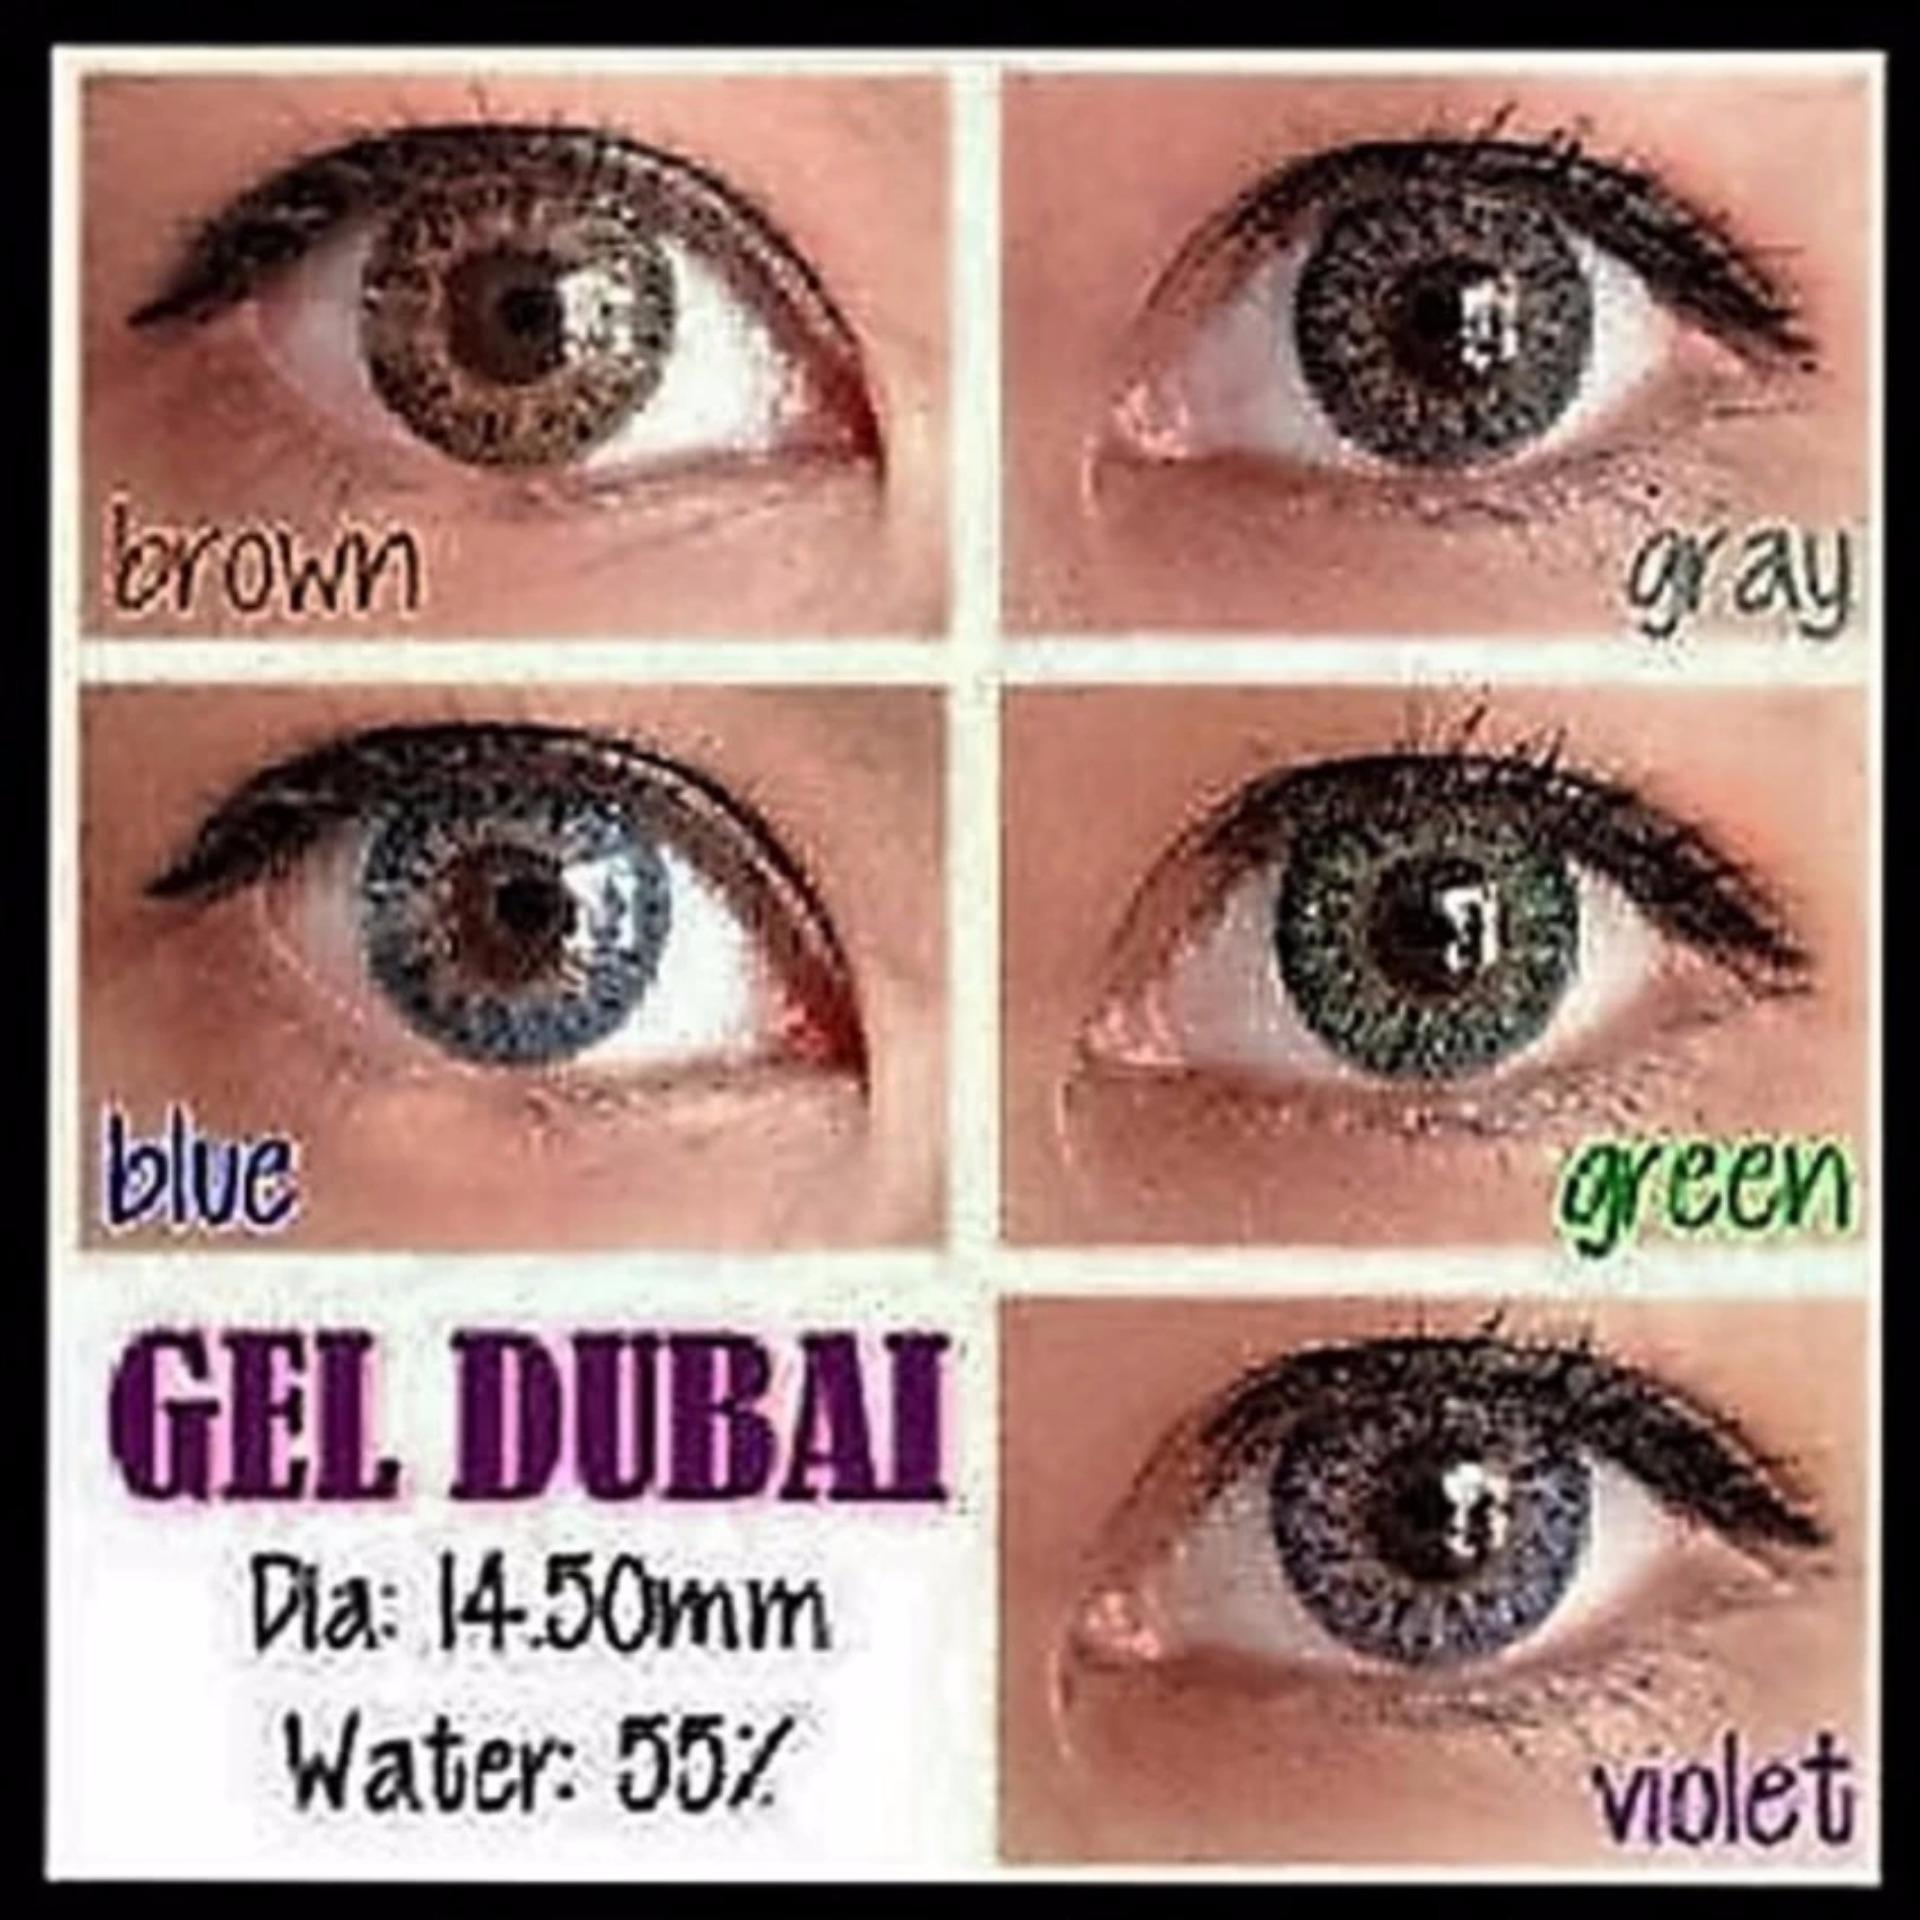 ... Gel New Dubai Softlens - Green + Free Lenscase + Cairan 60ml ...